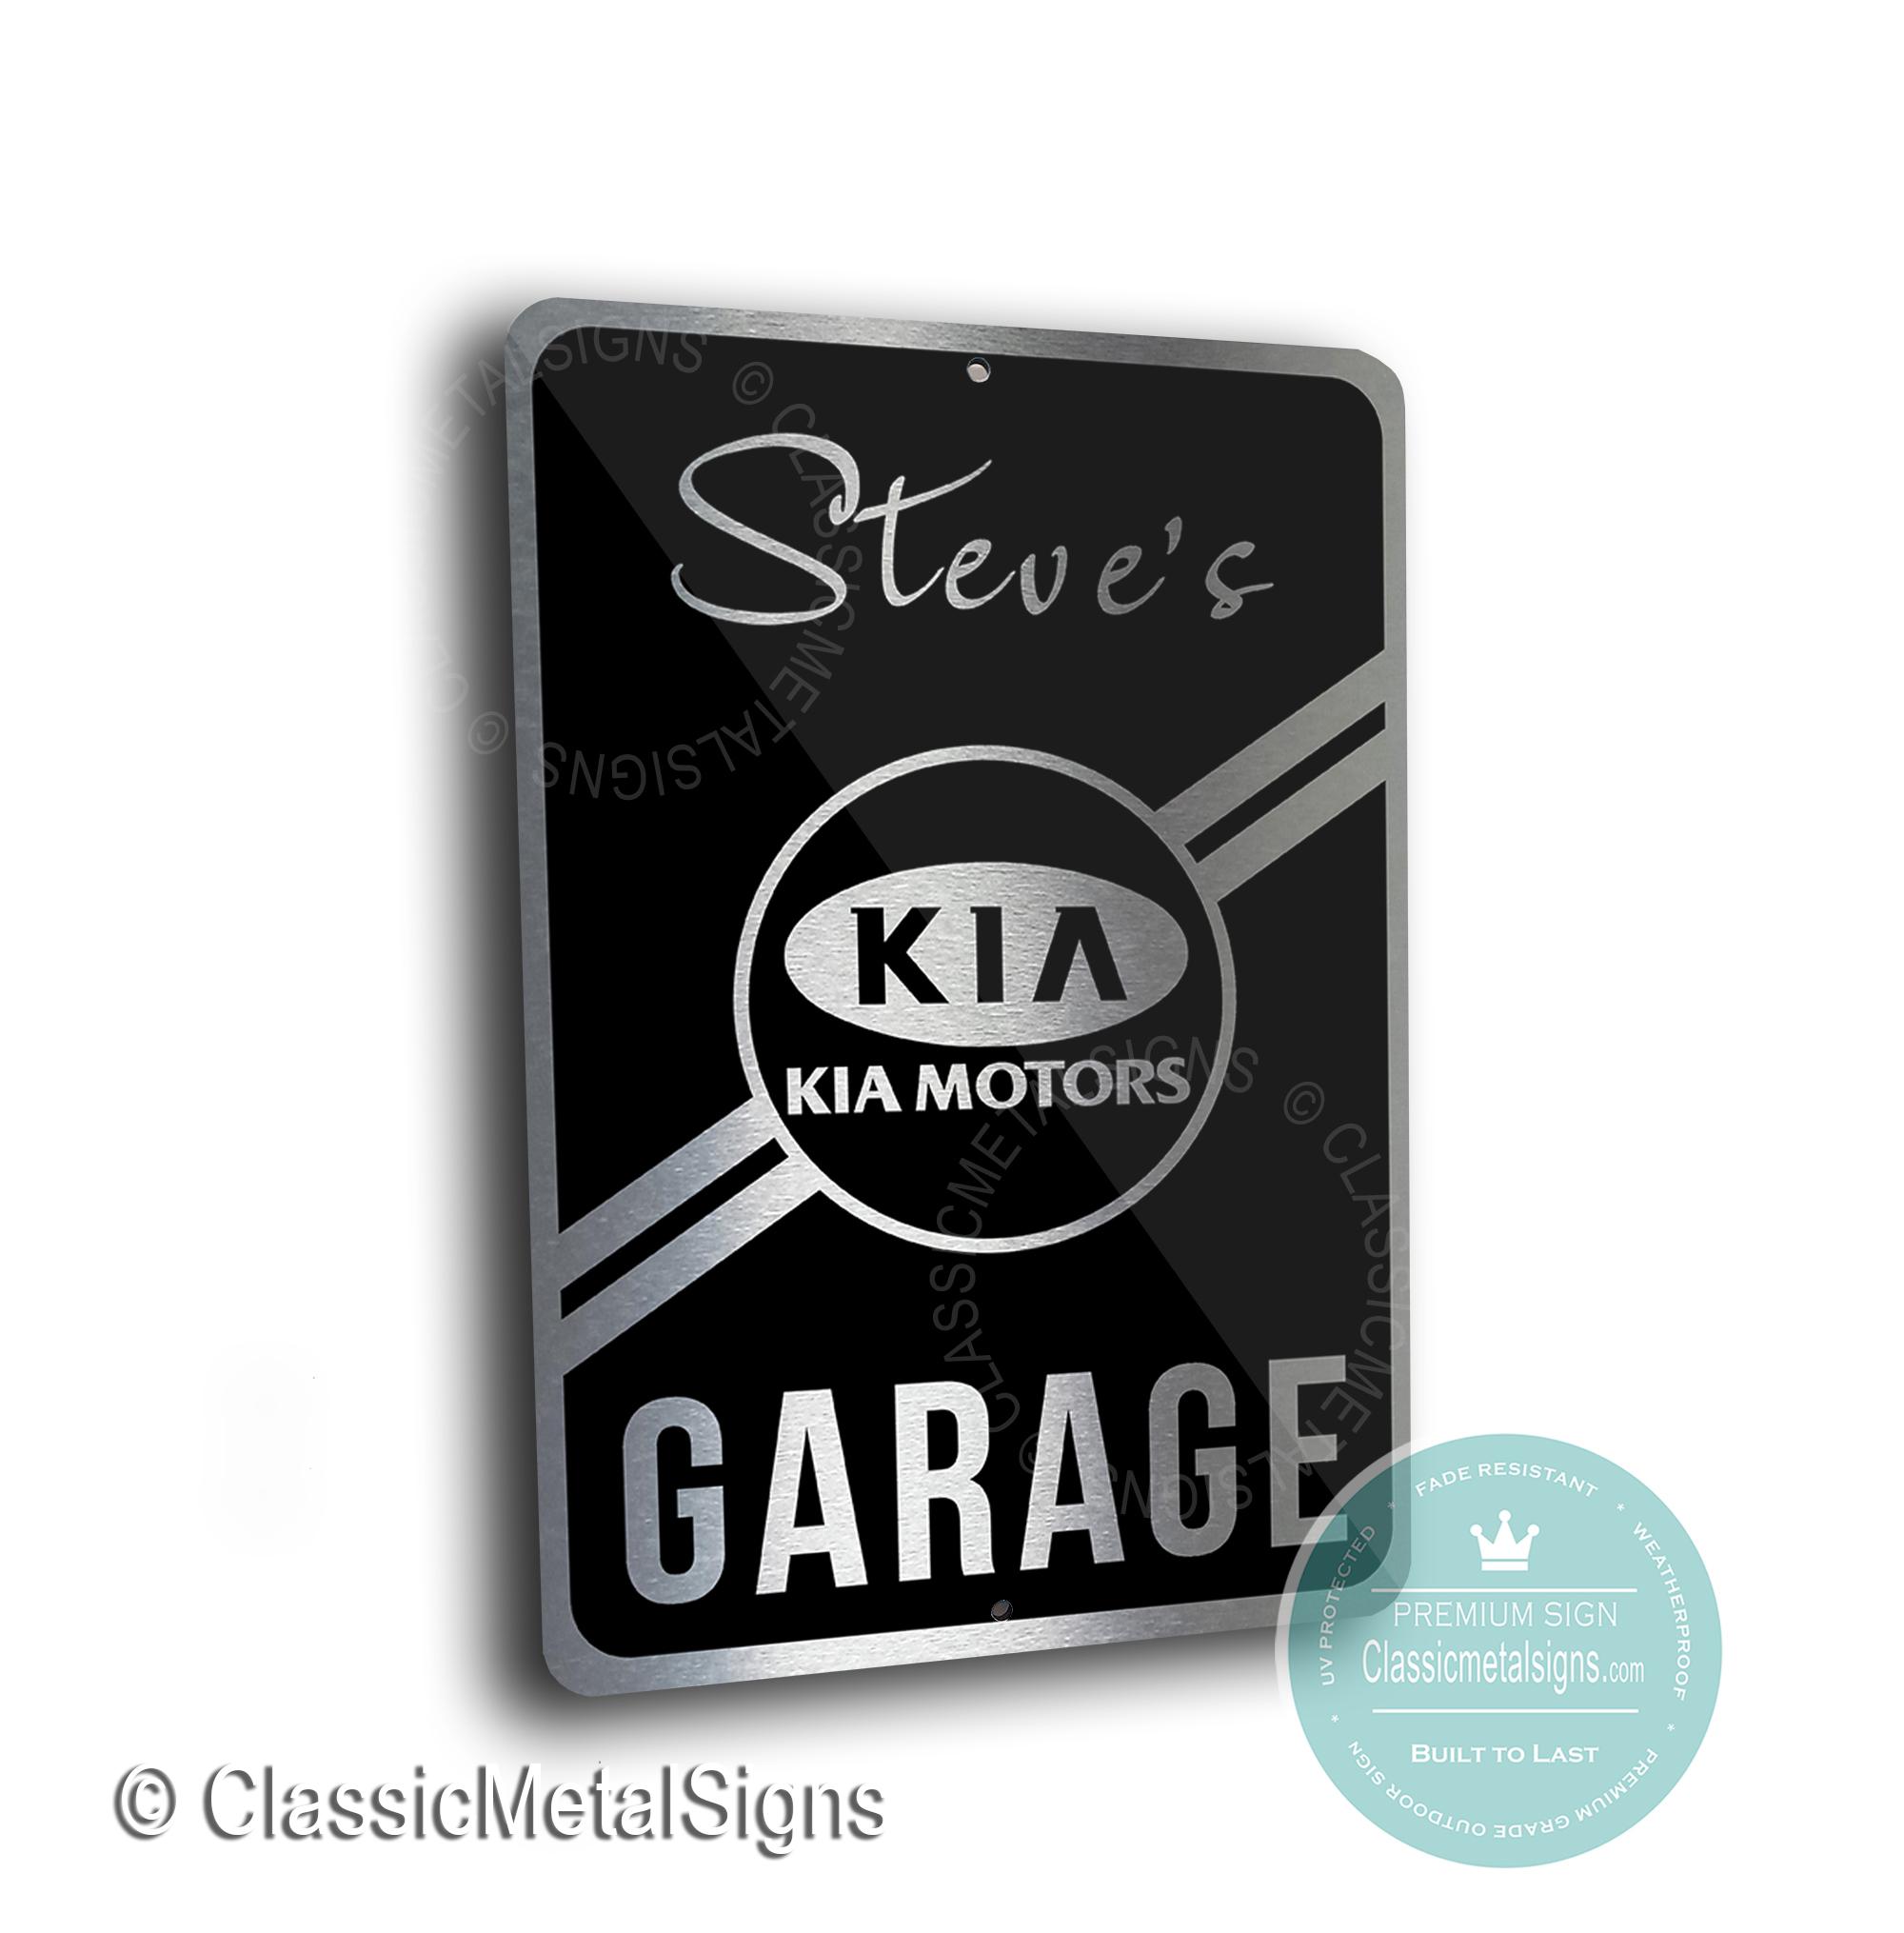 Kia Garage Signs